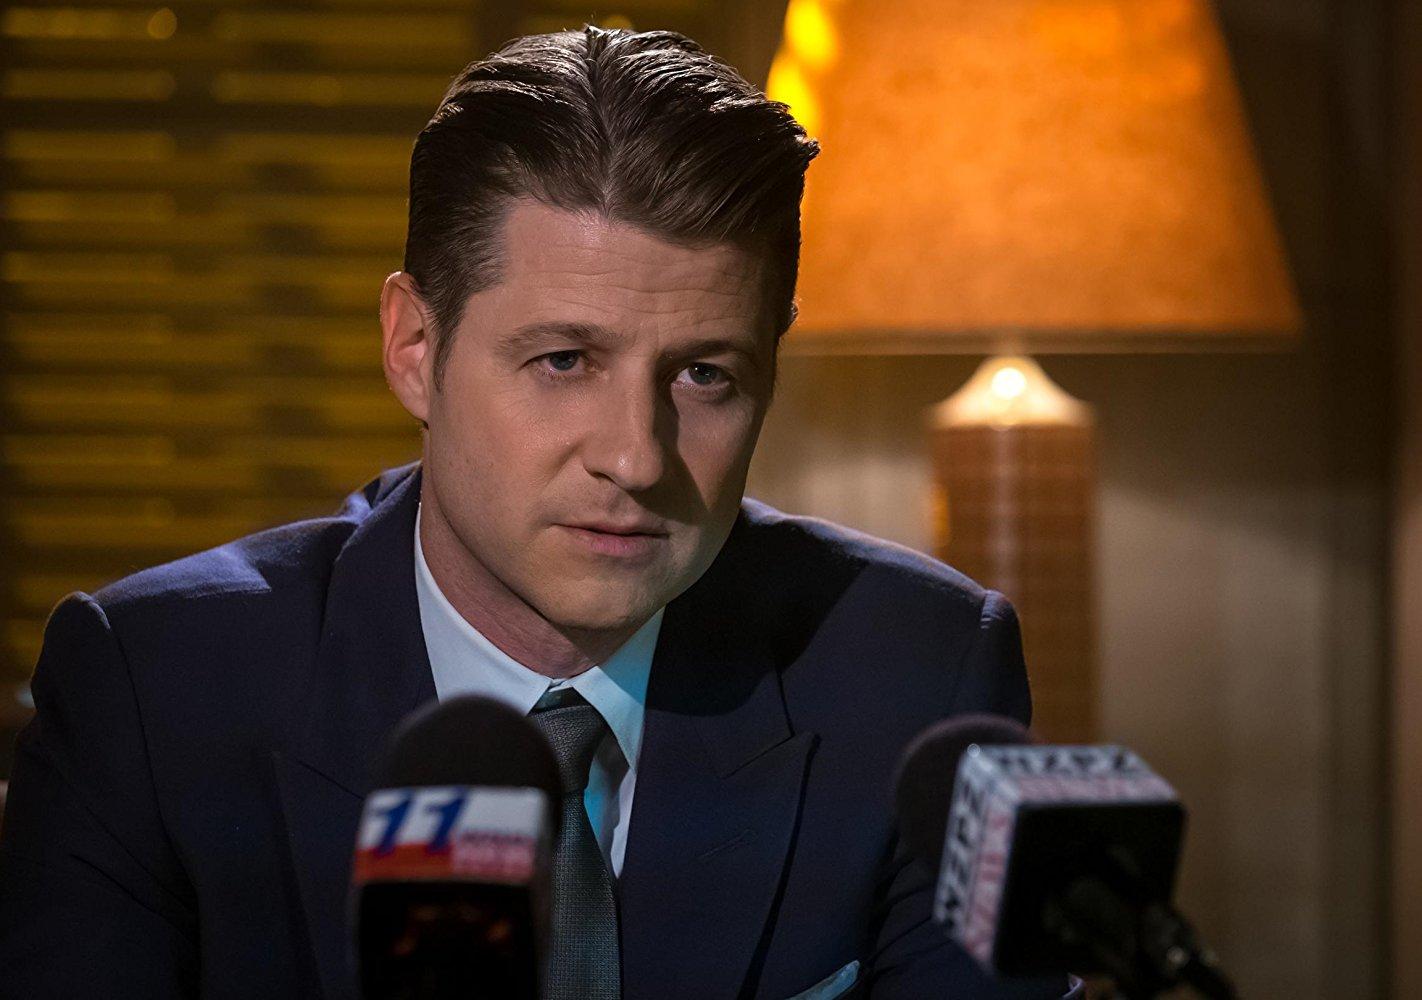 gotham season 4 episode 21 review